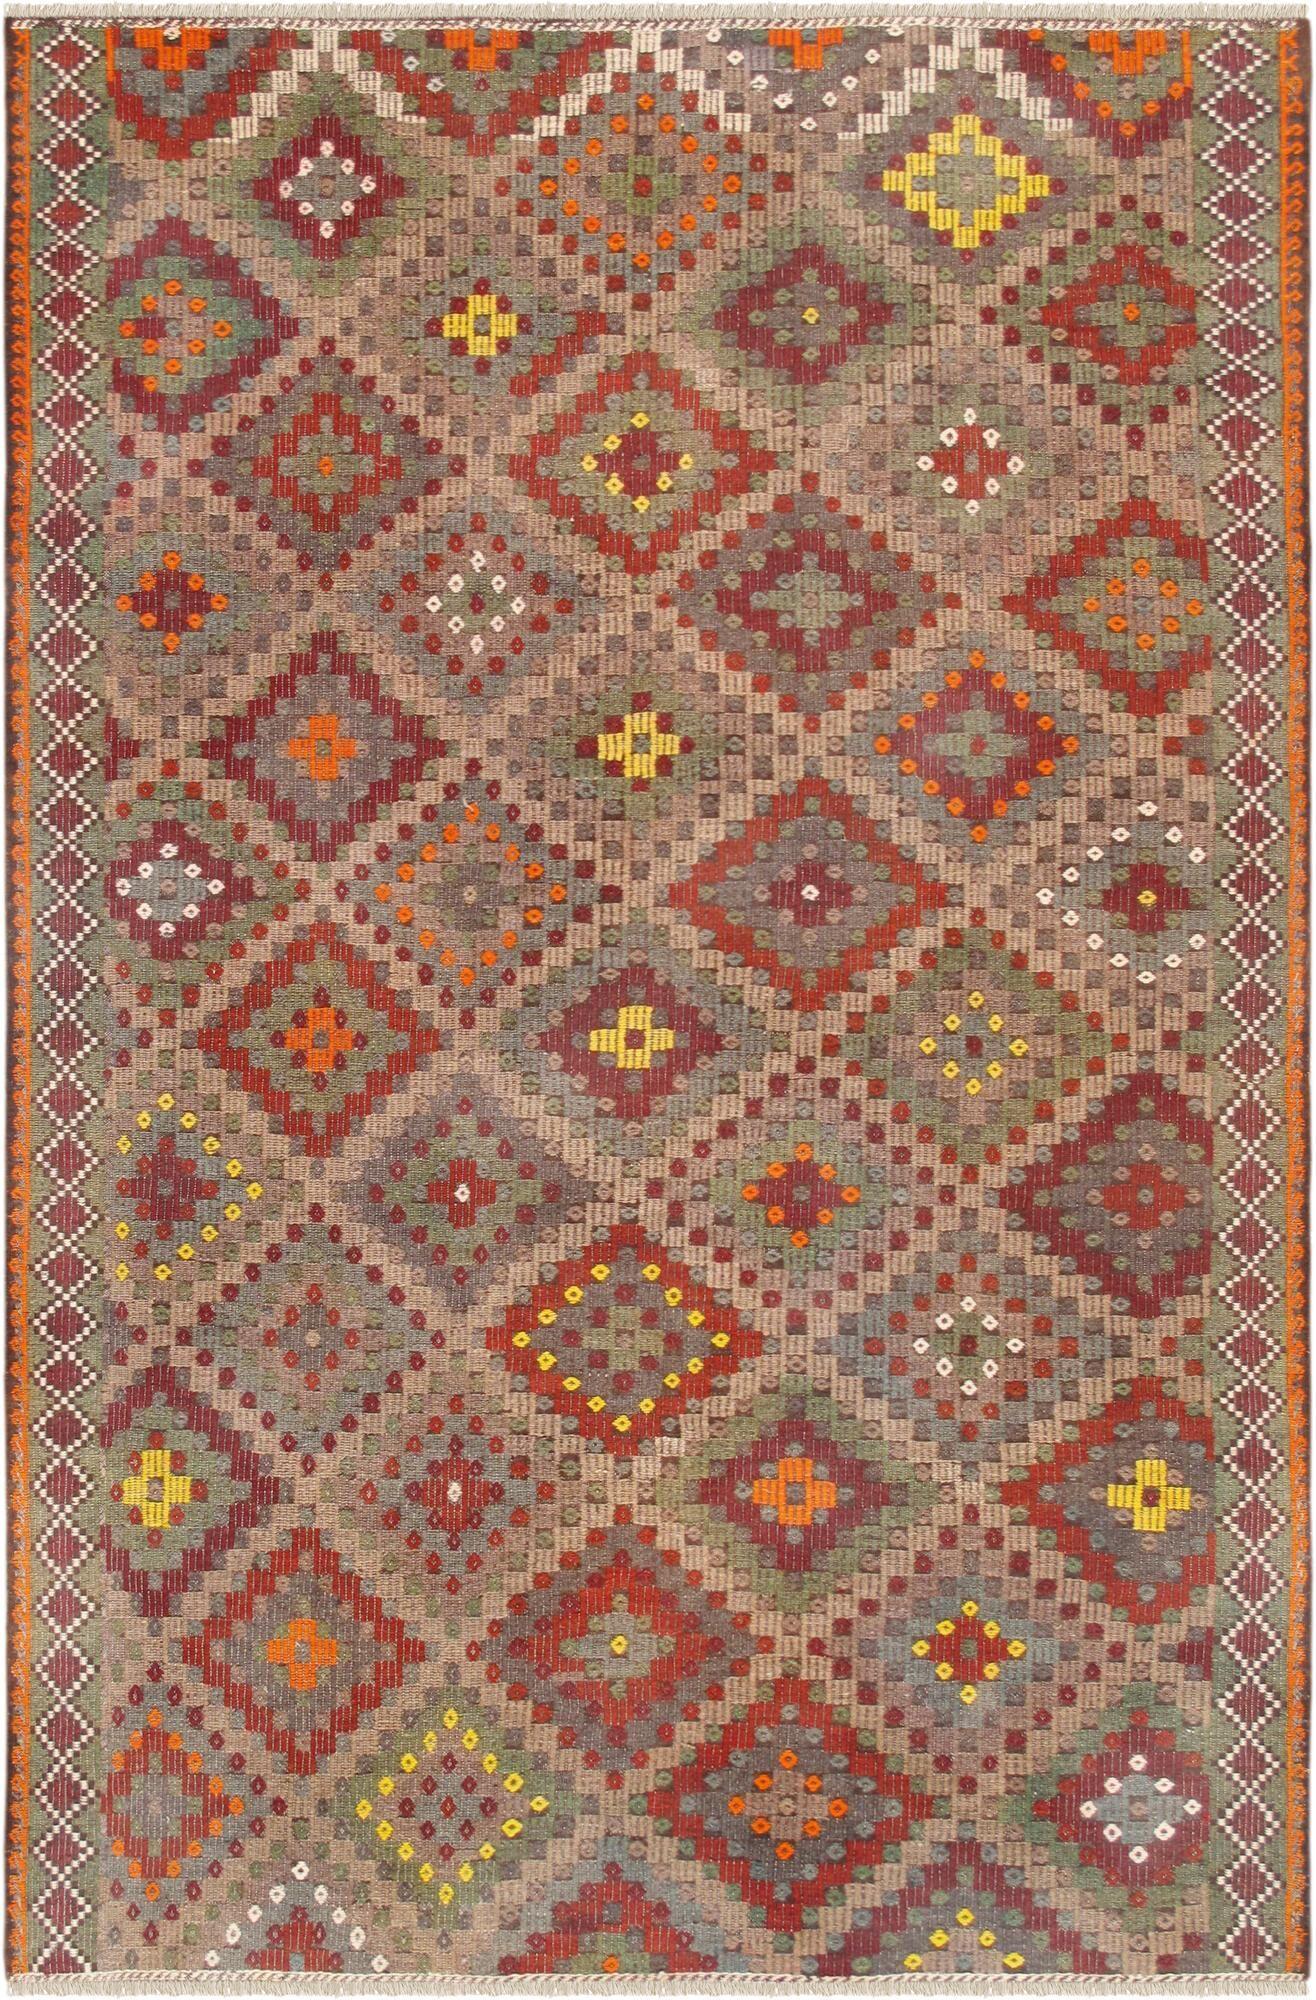 Vintage Kilim Hand-Woven Wool Beige/Red Area Rug